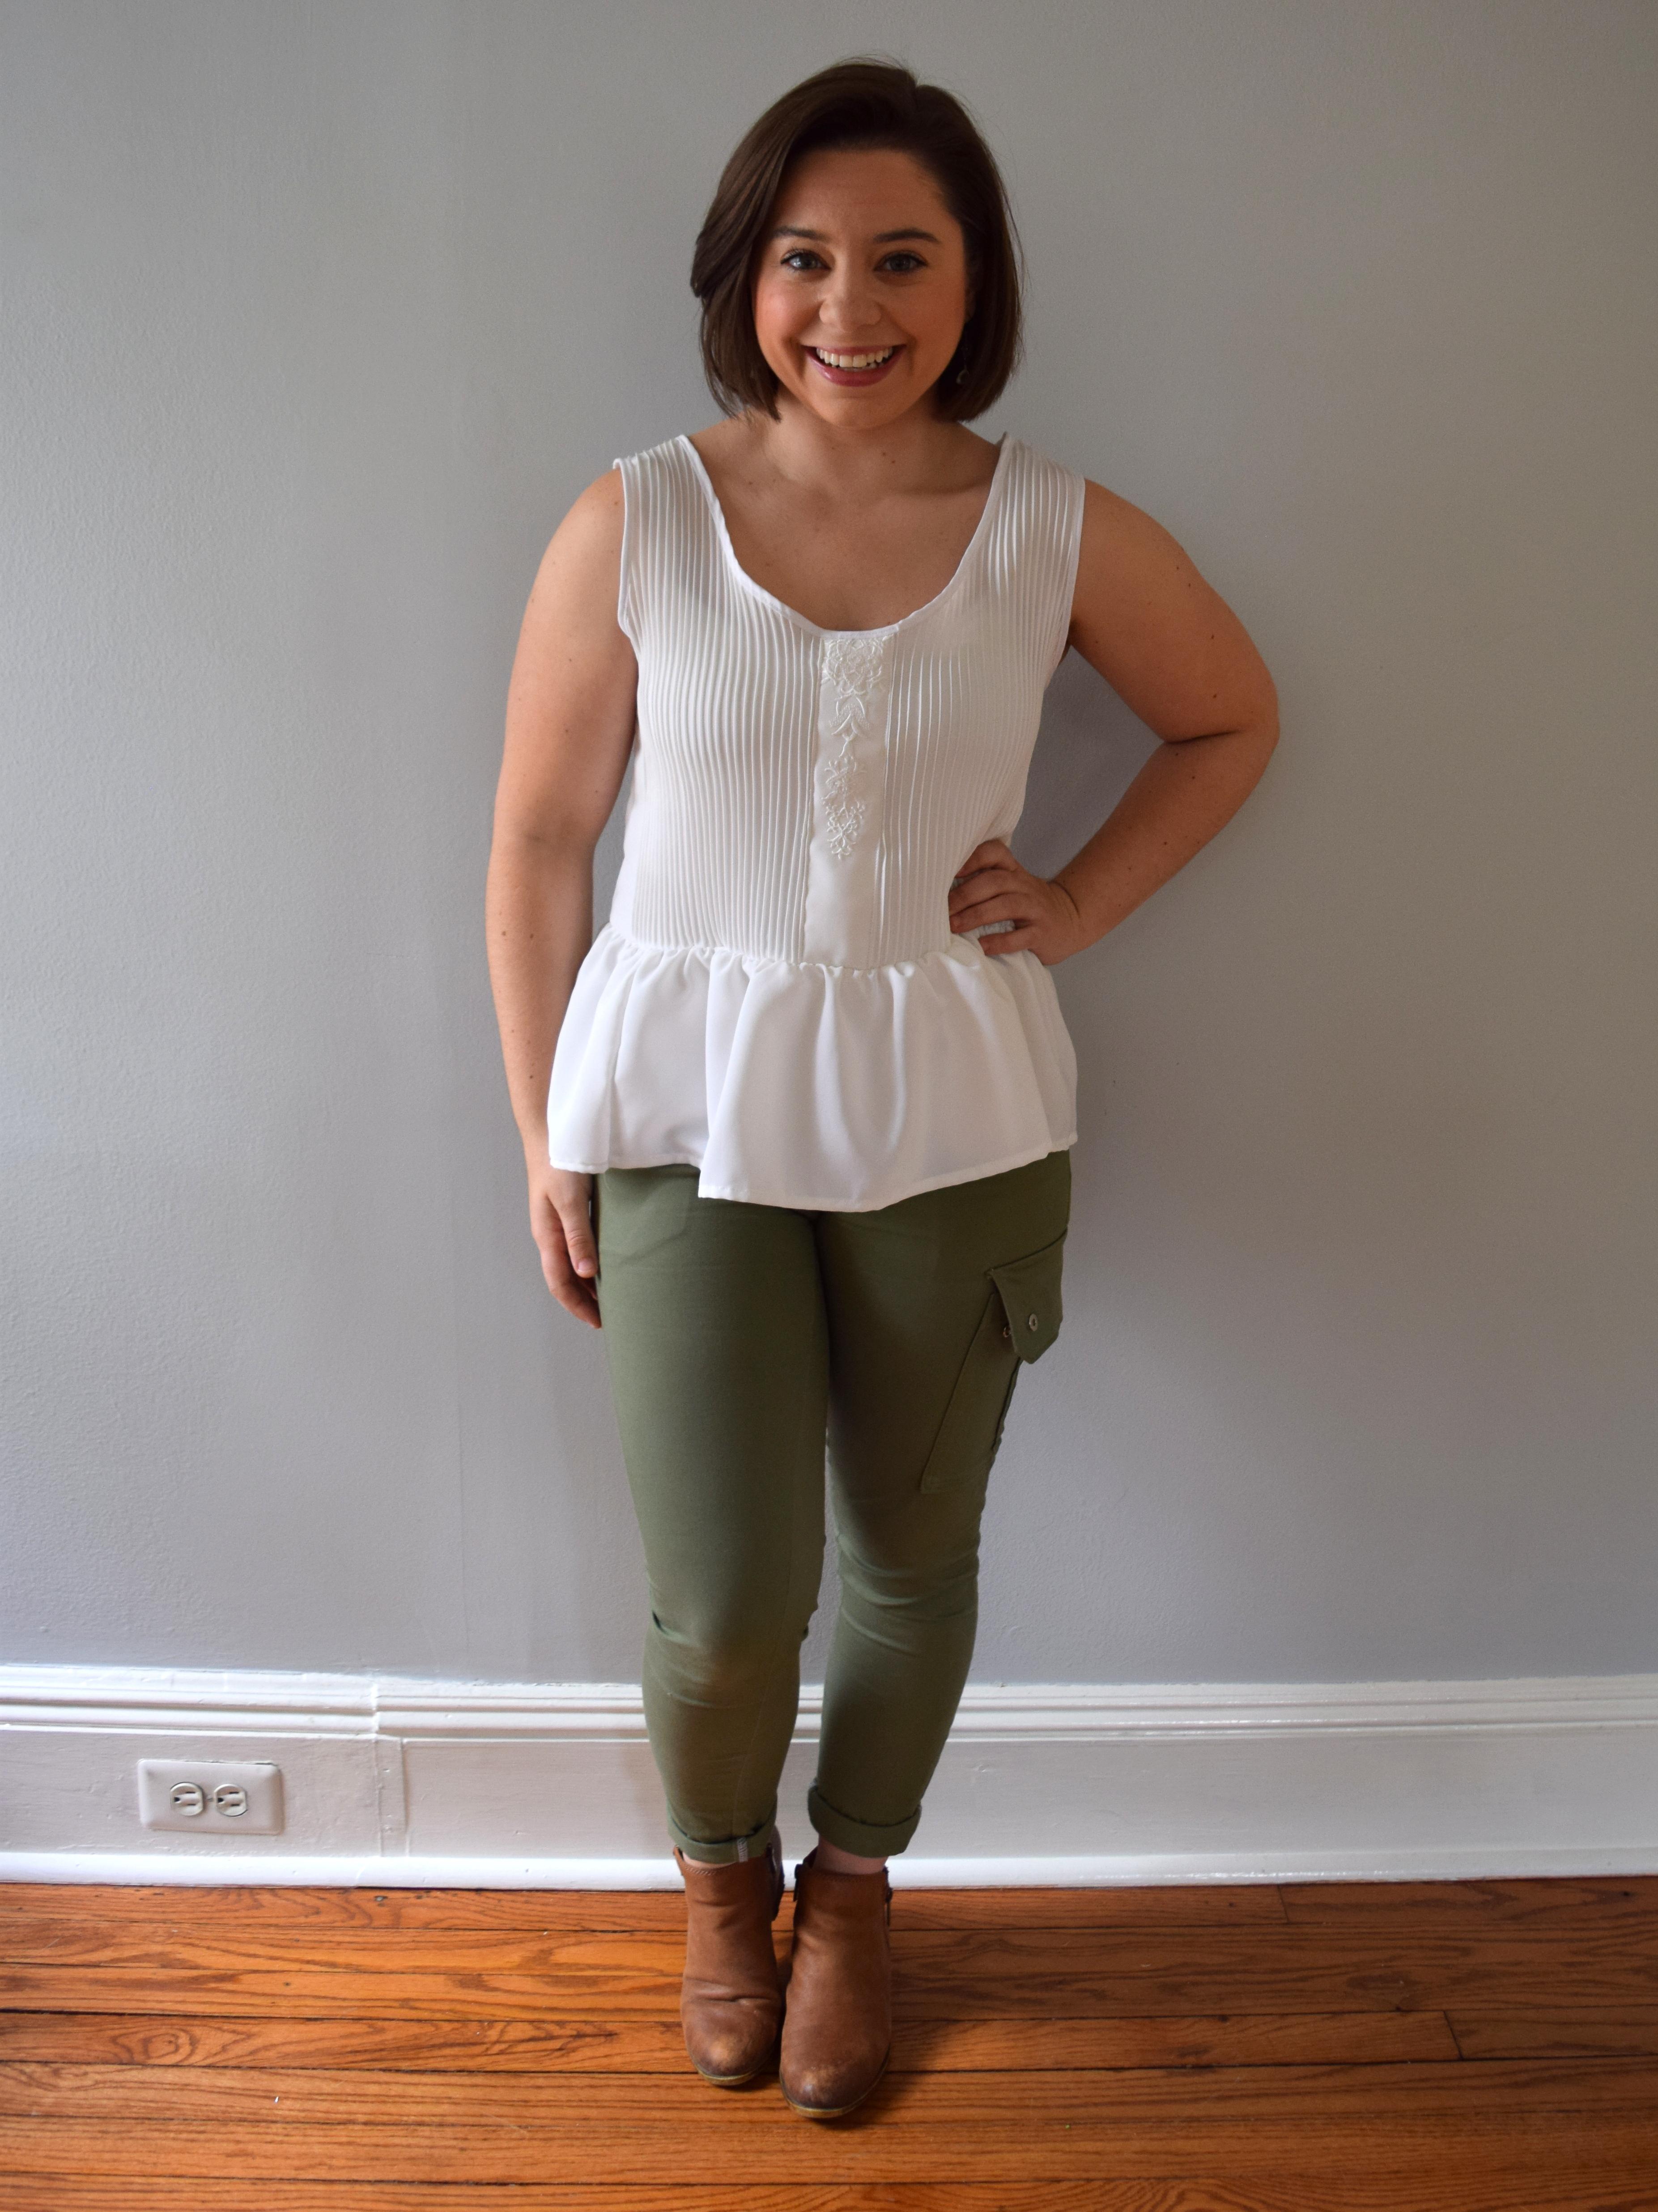 #RefashionFriday Blouse to Peplum Tank - Trish Stitched